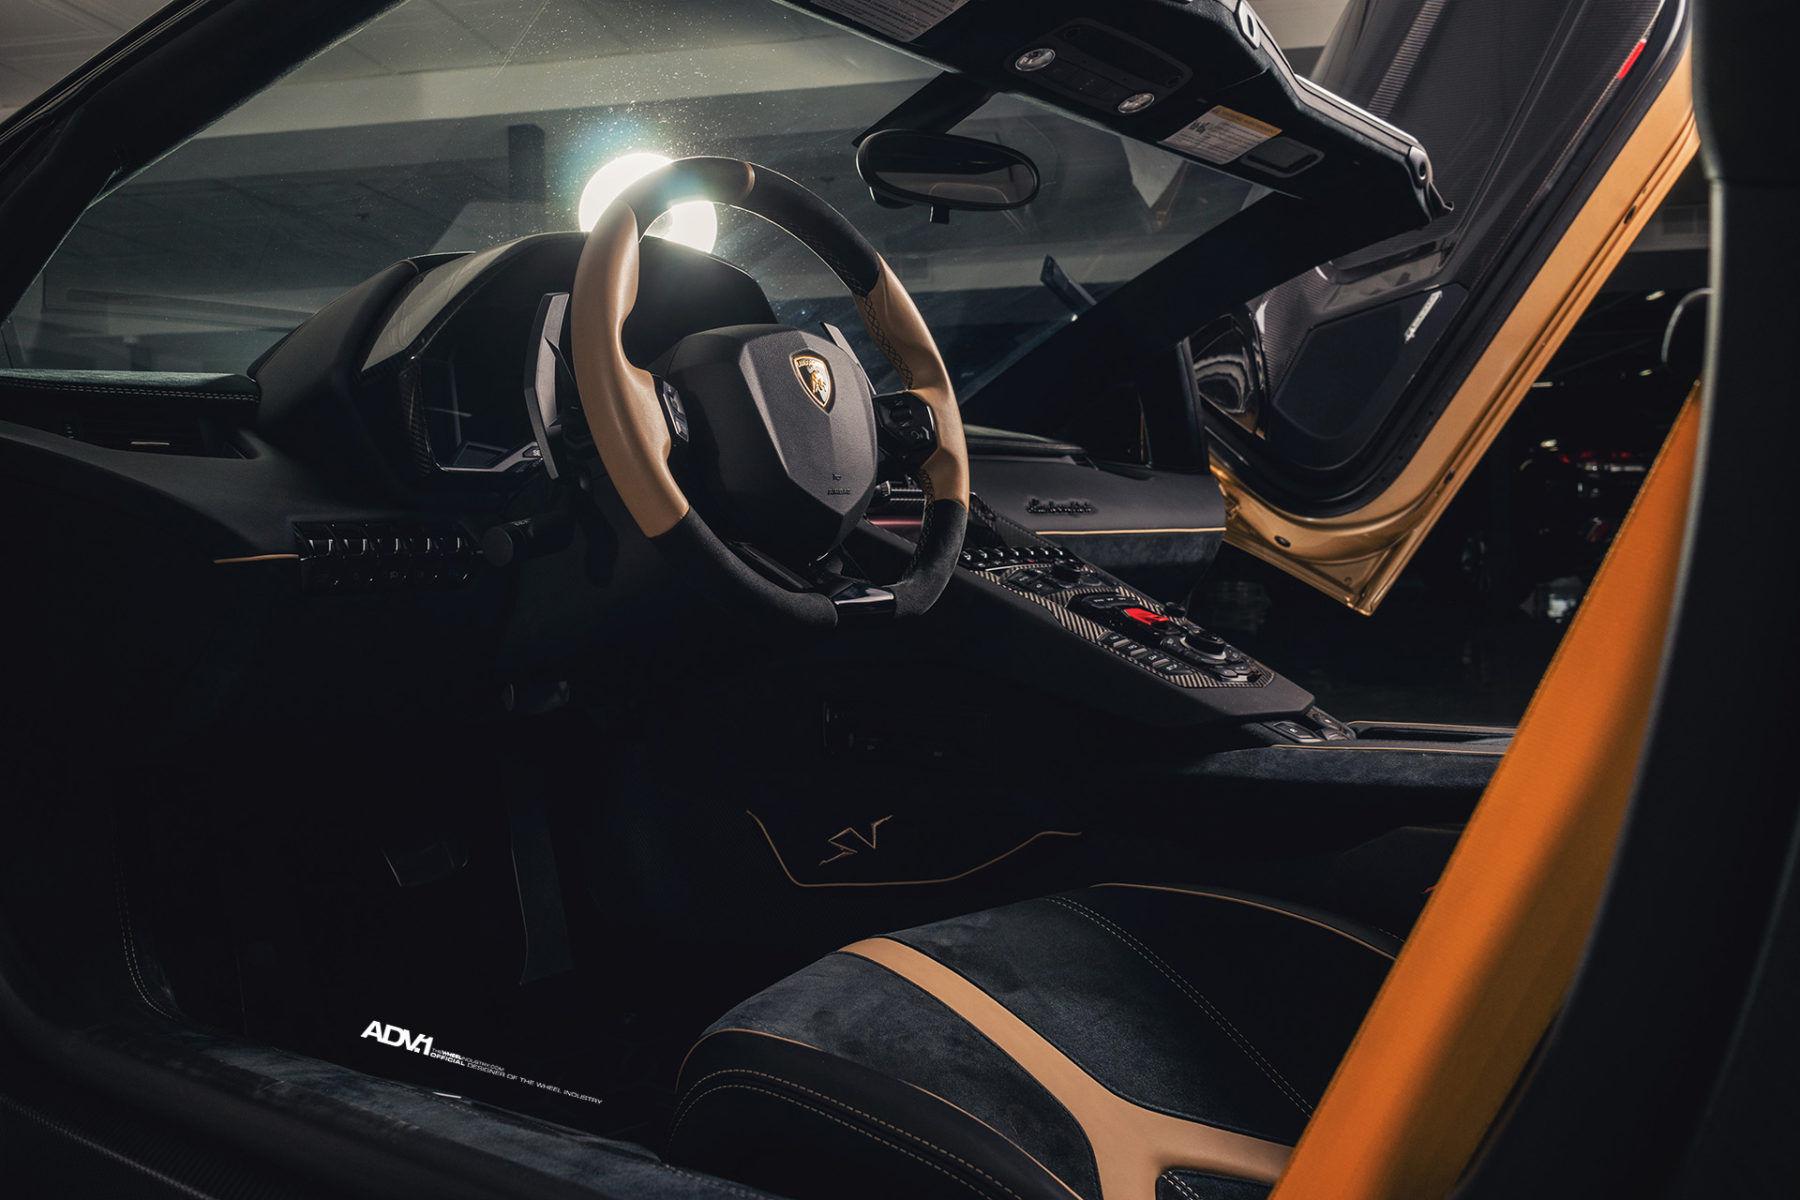 Lamborghini Aventador   Gold Lamborghini Aventador SV Roadster LP750-4 - ADV1 ADV5.3 Track Spec CS Series Centerlock